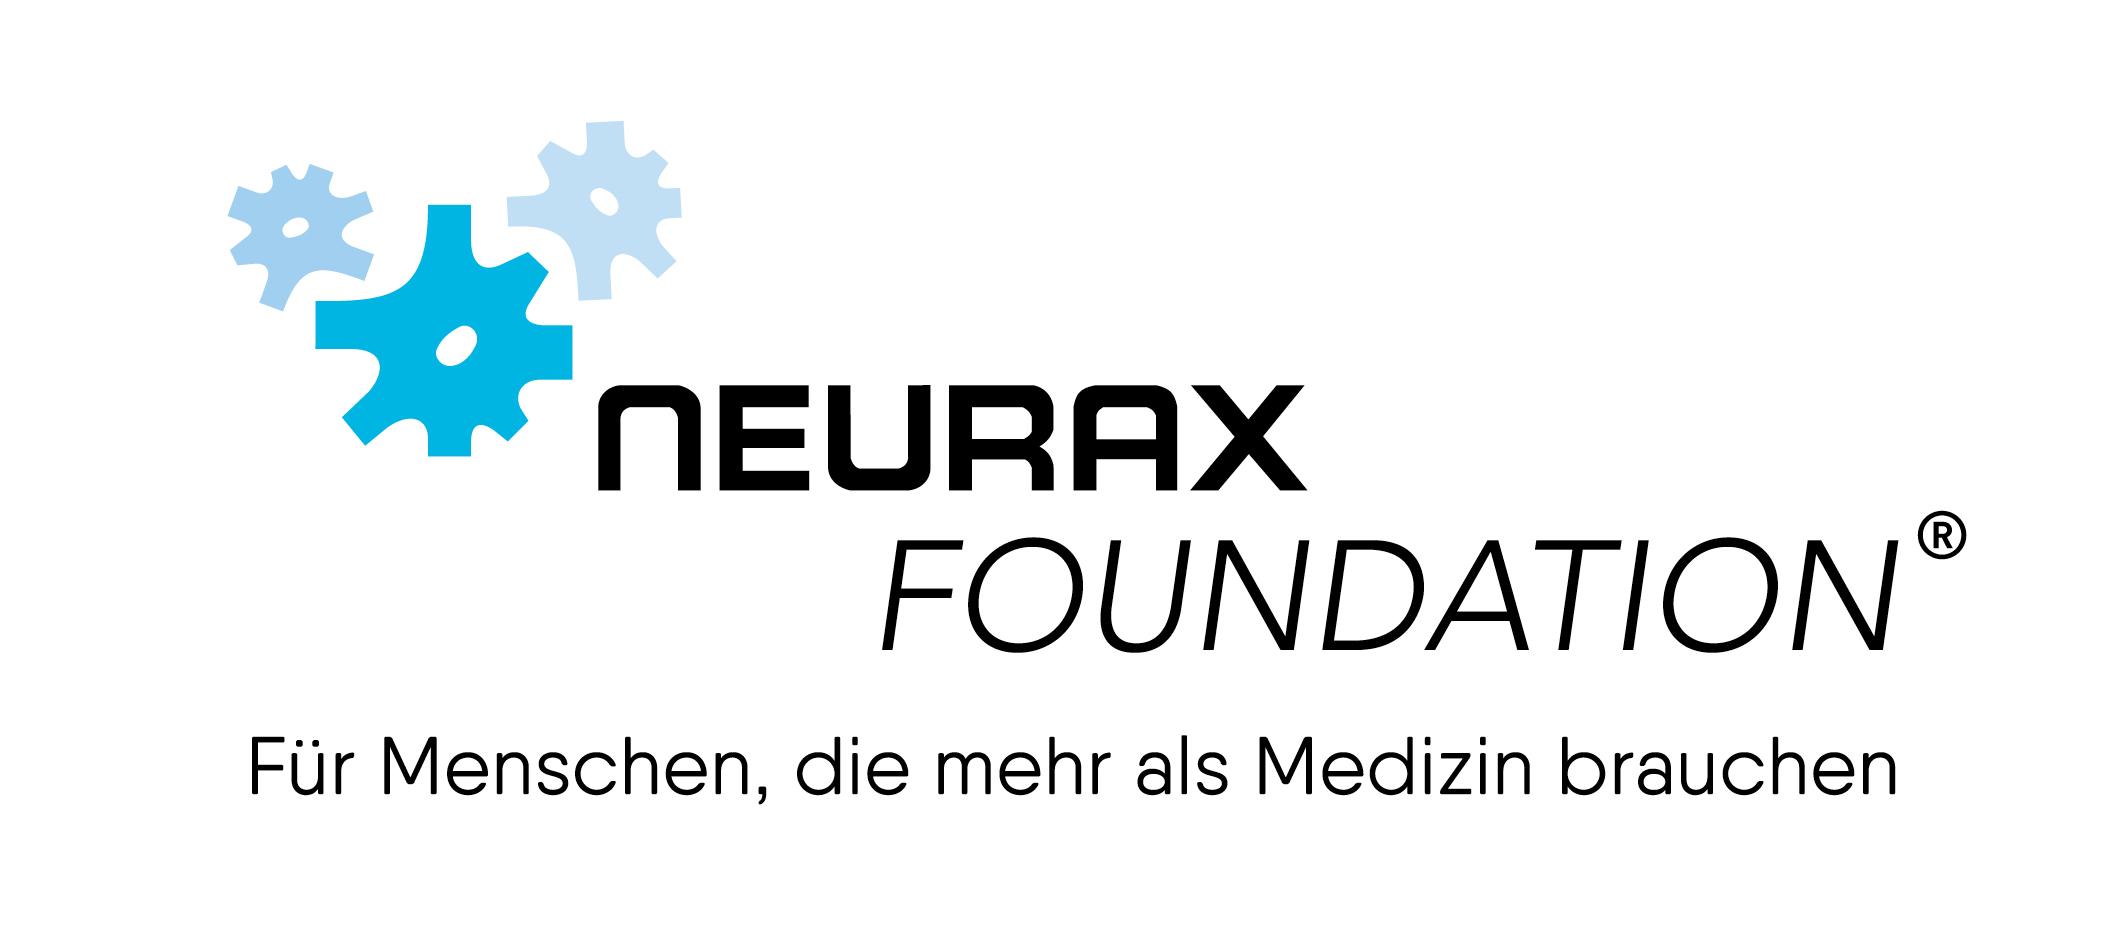 NEURAX_FOUNDATION_mit_claim